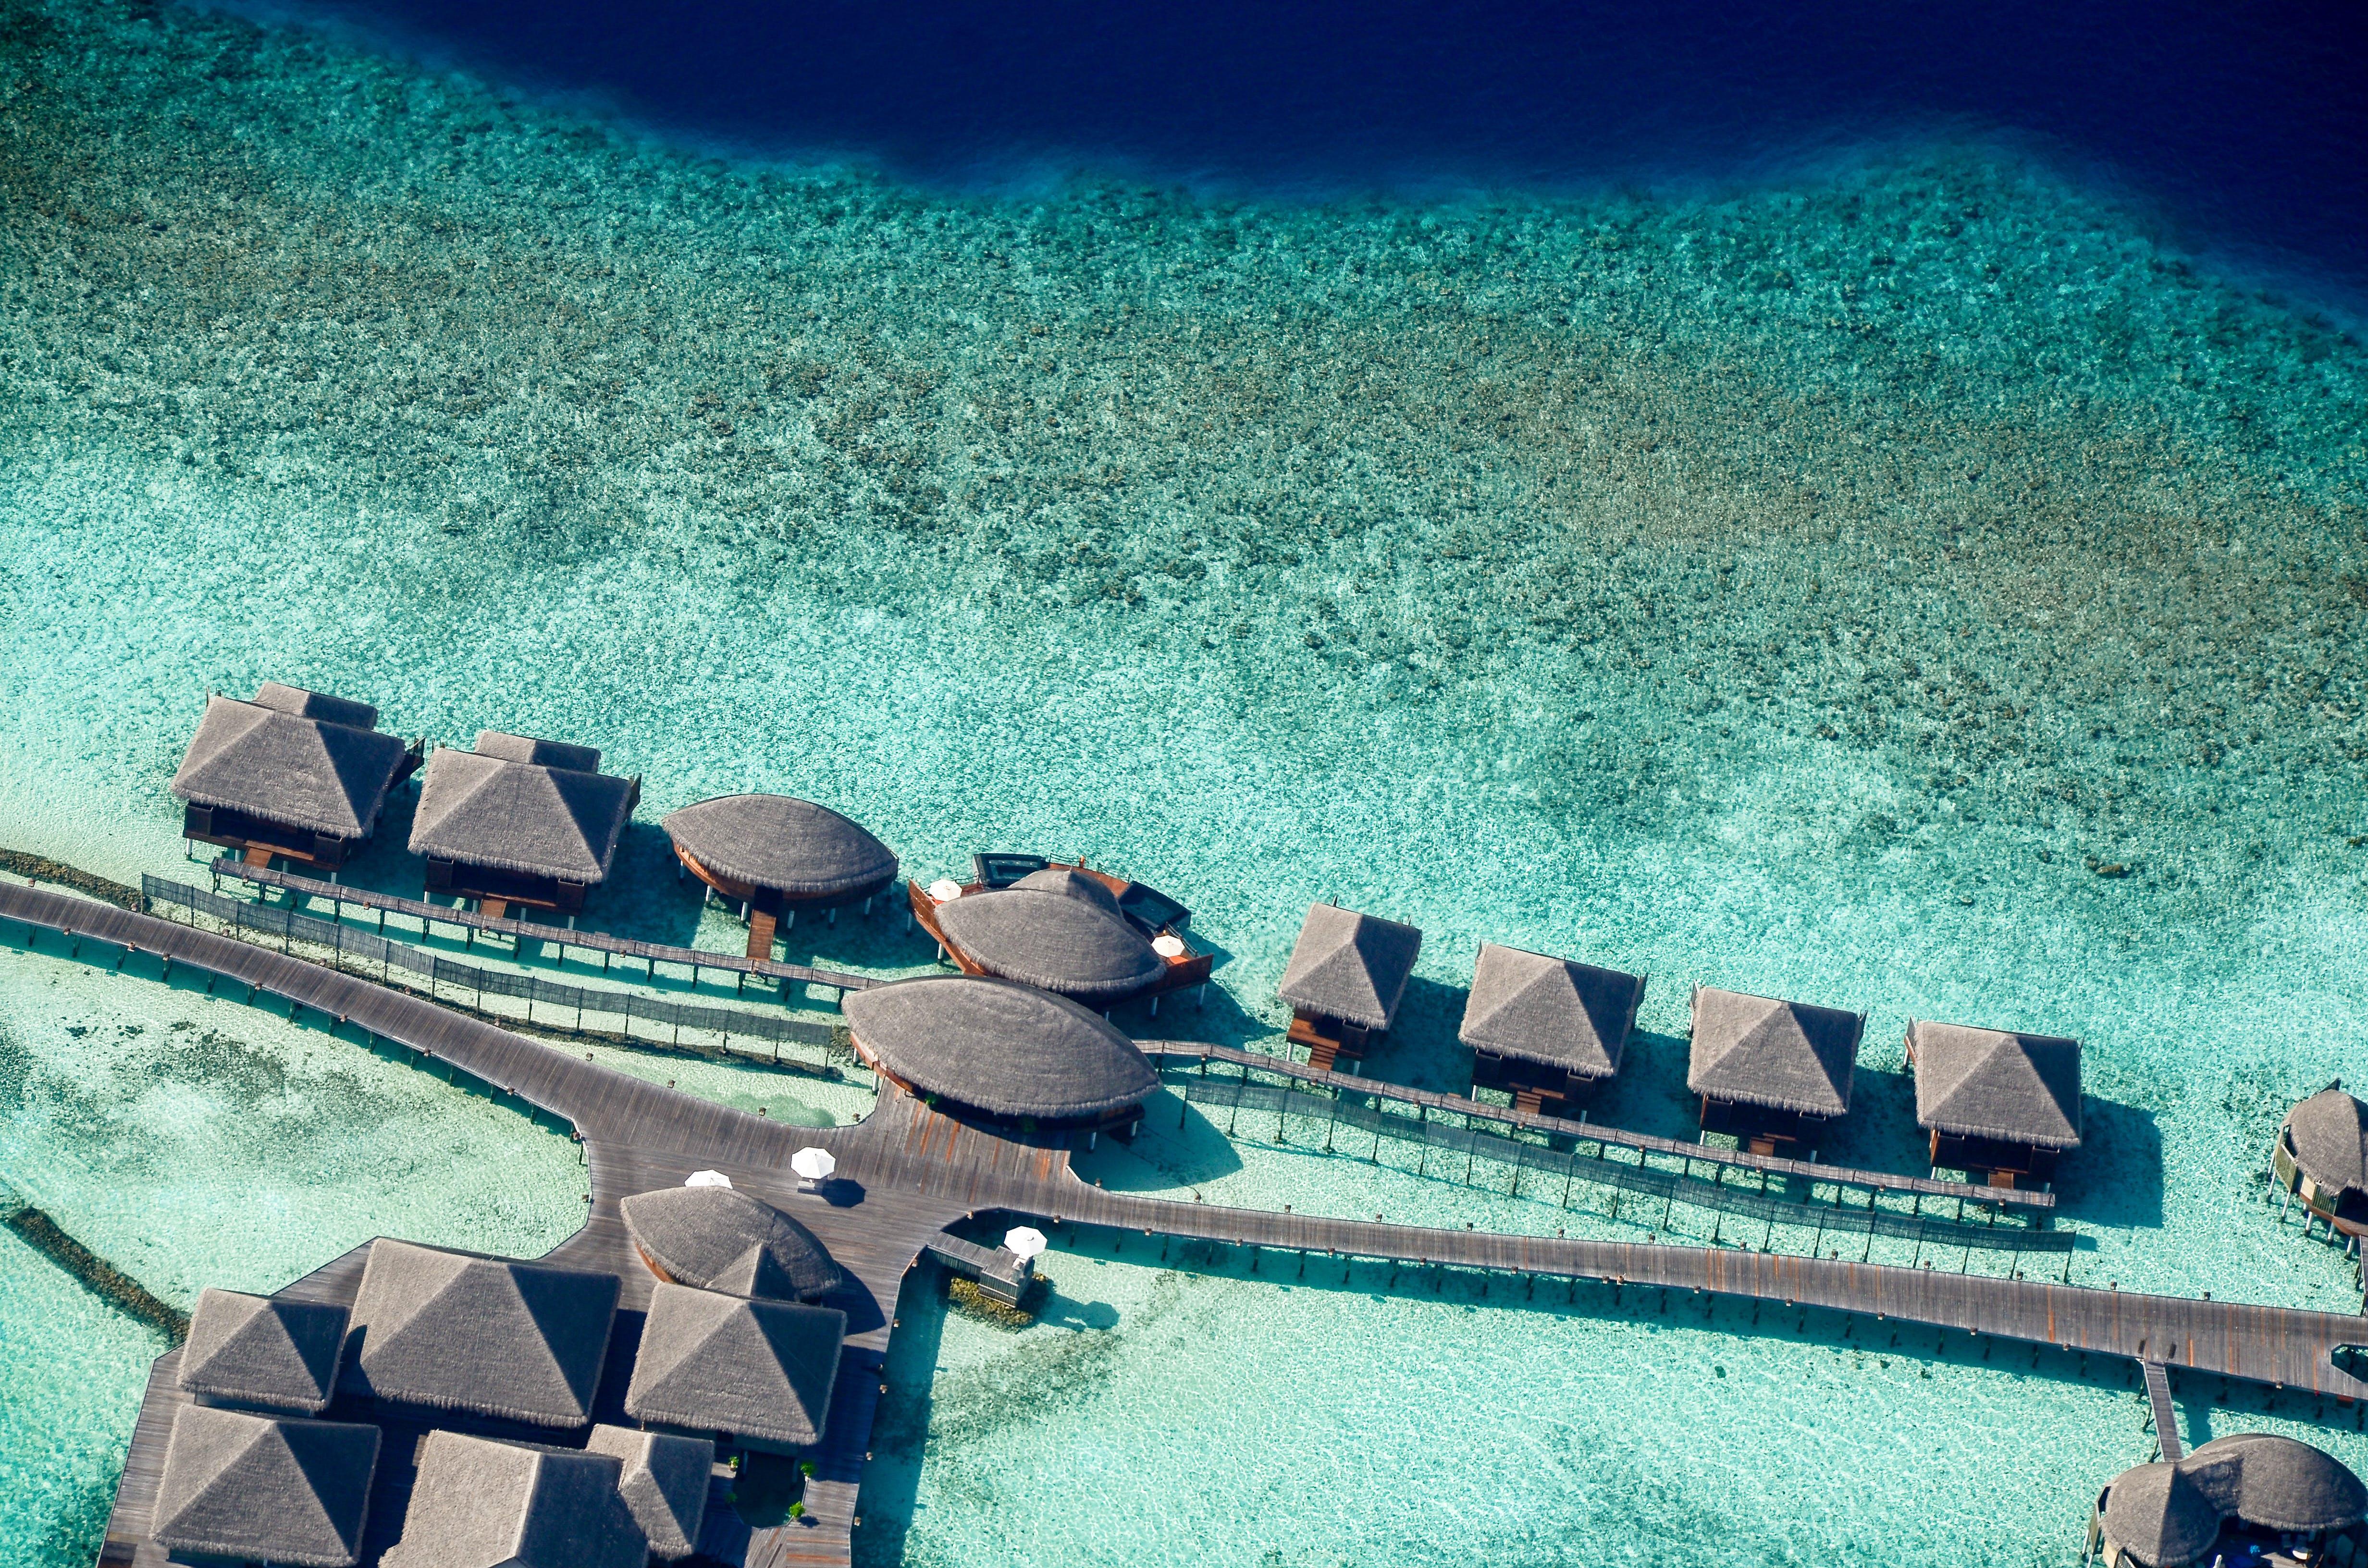 Bird's-eye View Photo of Cabanas